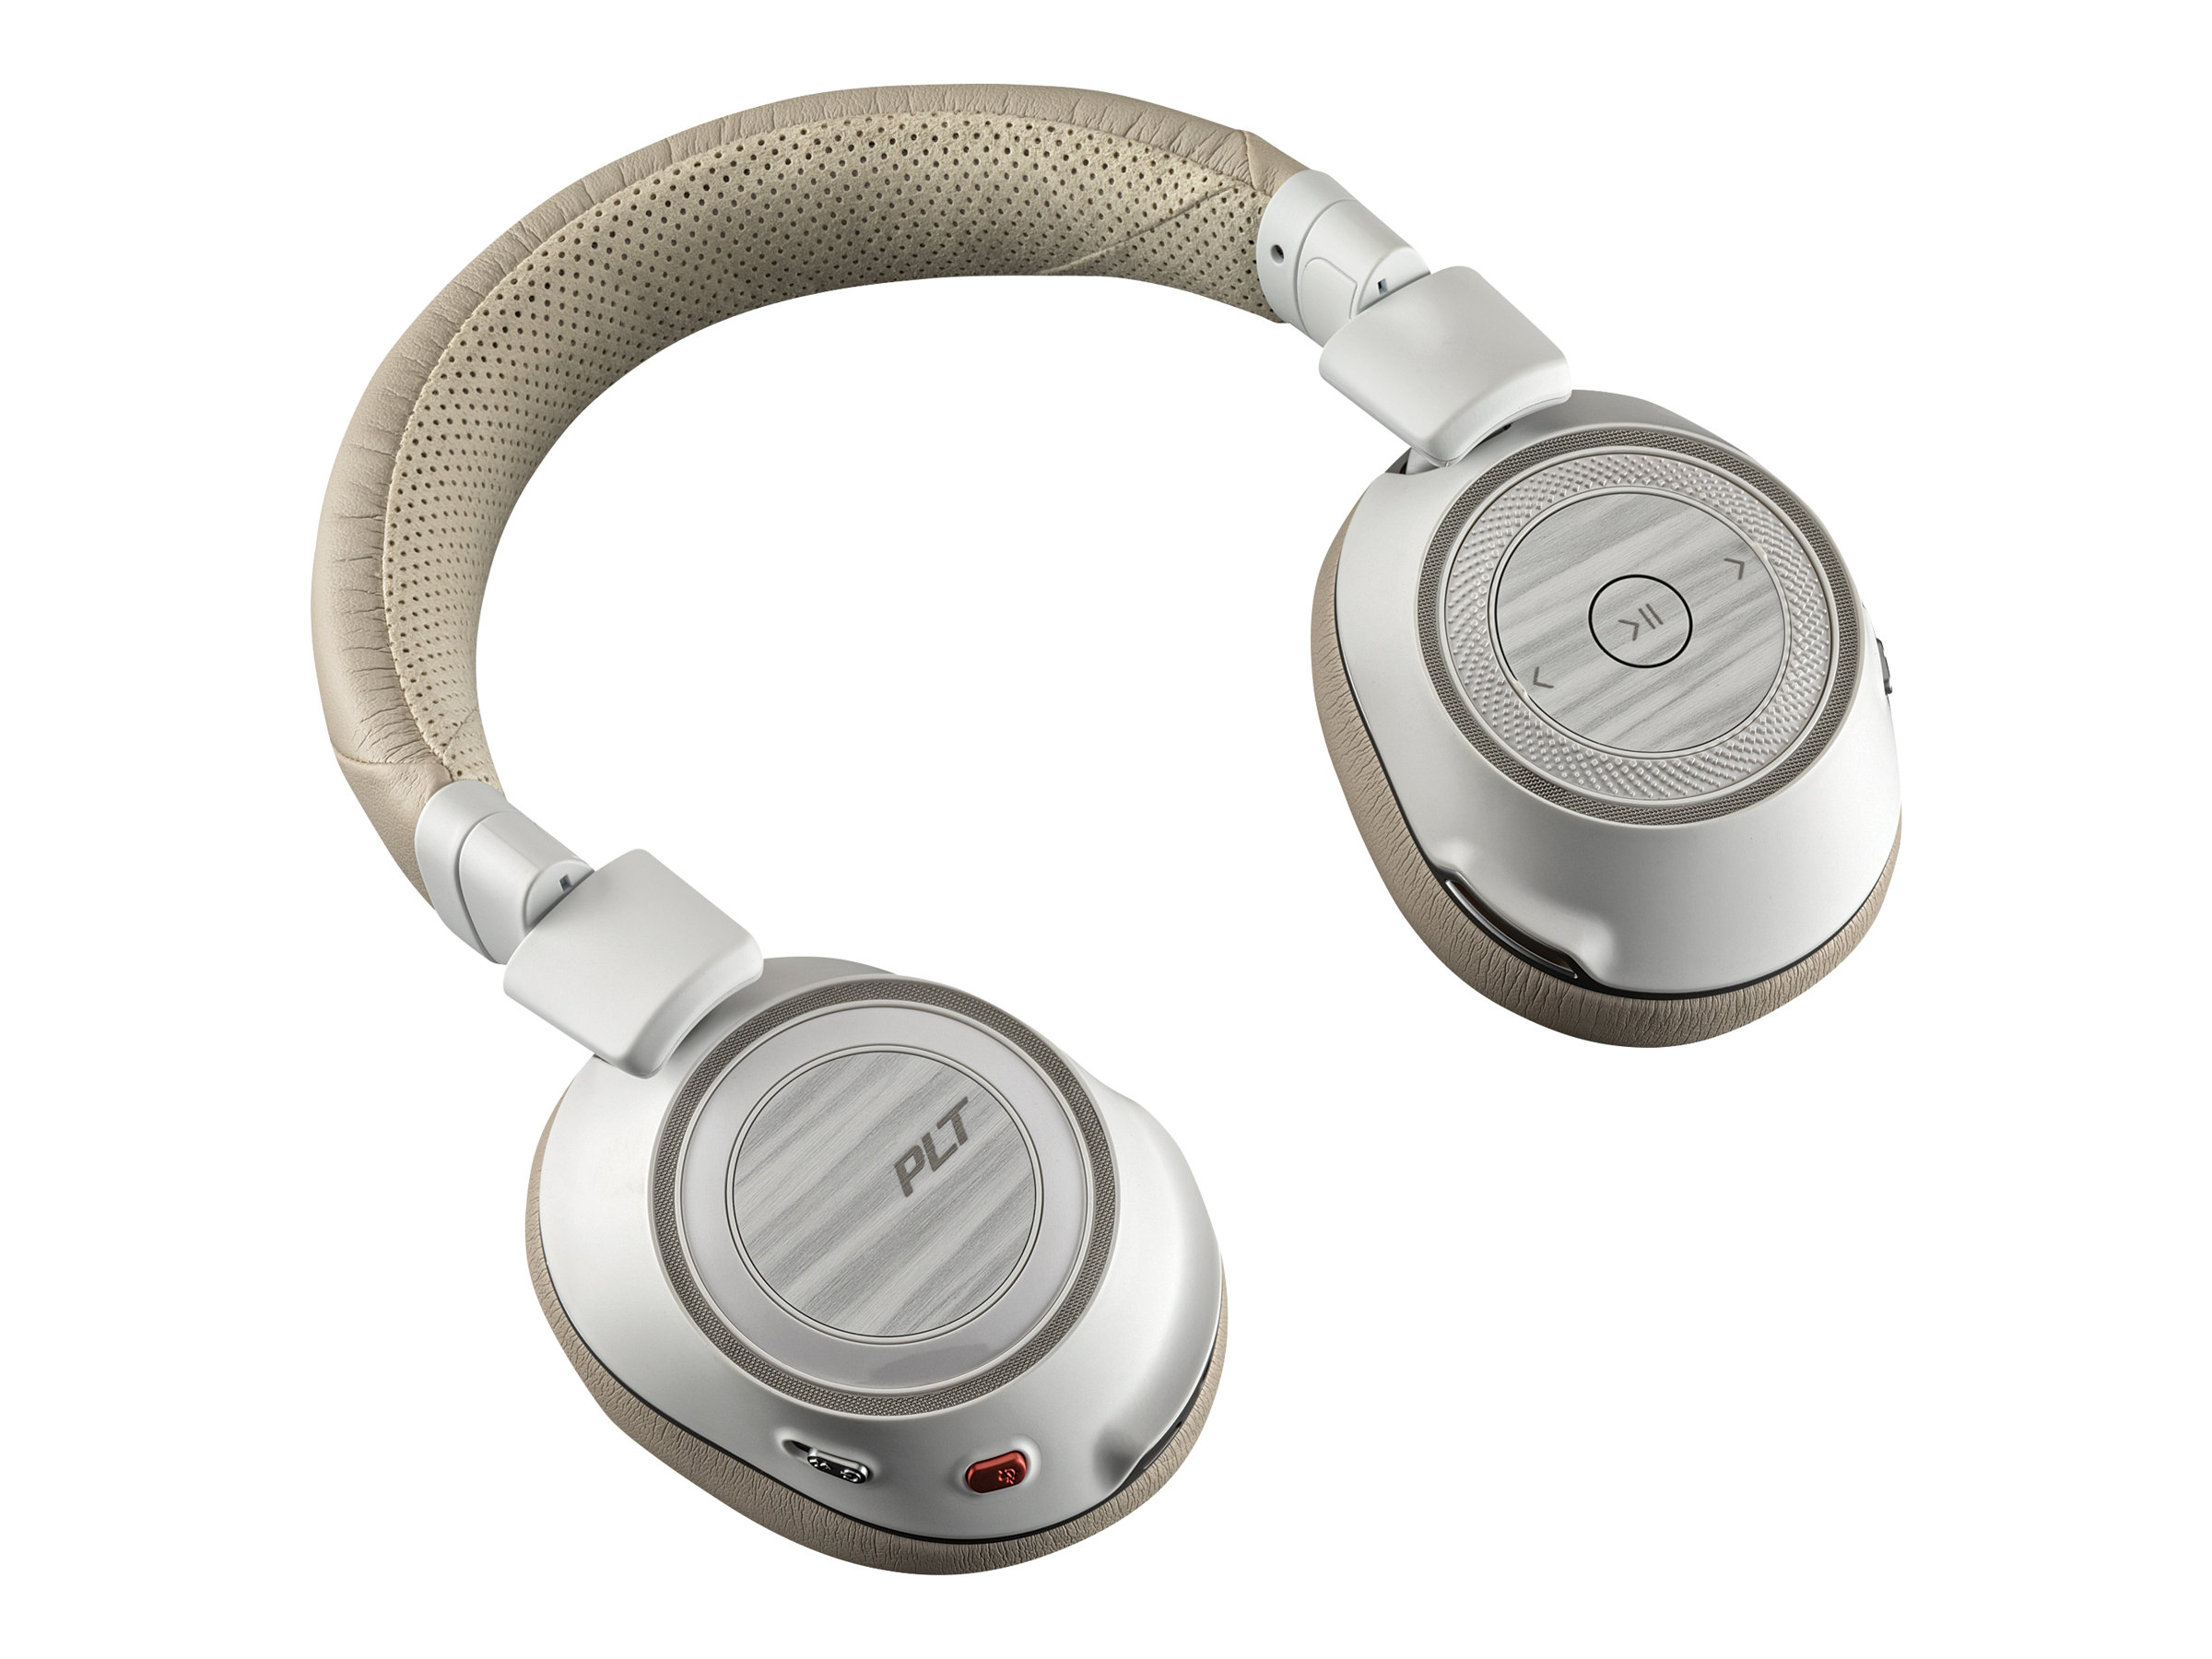 DCS - Over ear - Plantronics Voyager 8200 UC Trådløs Hvid Beige